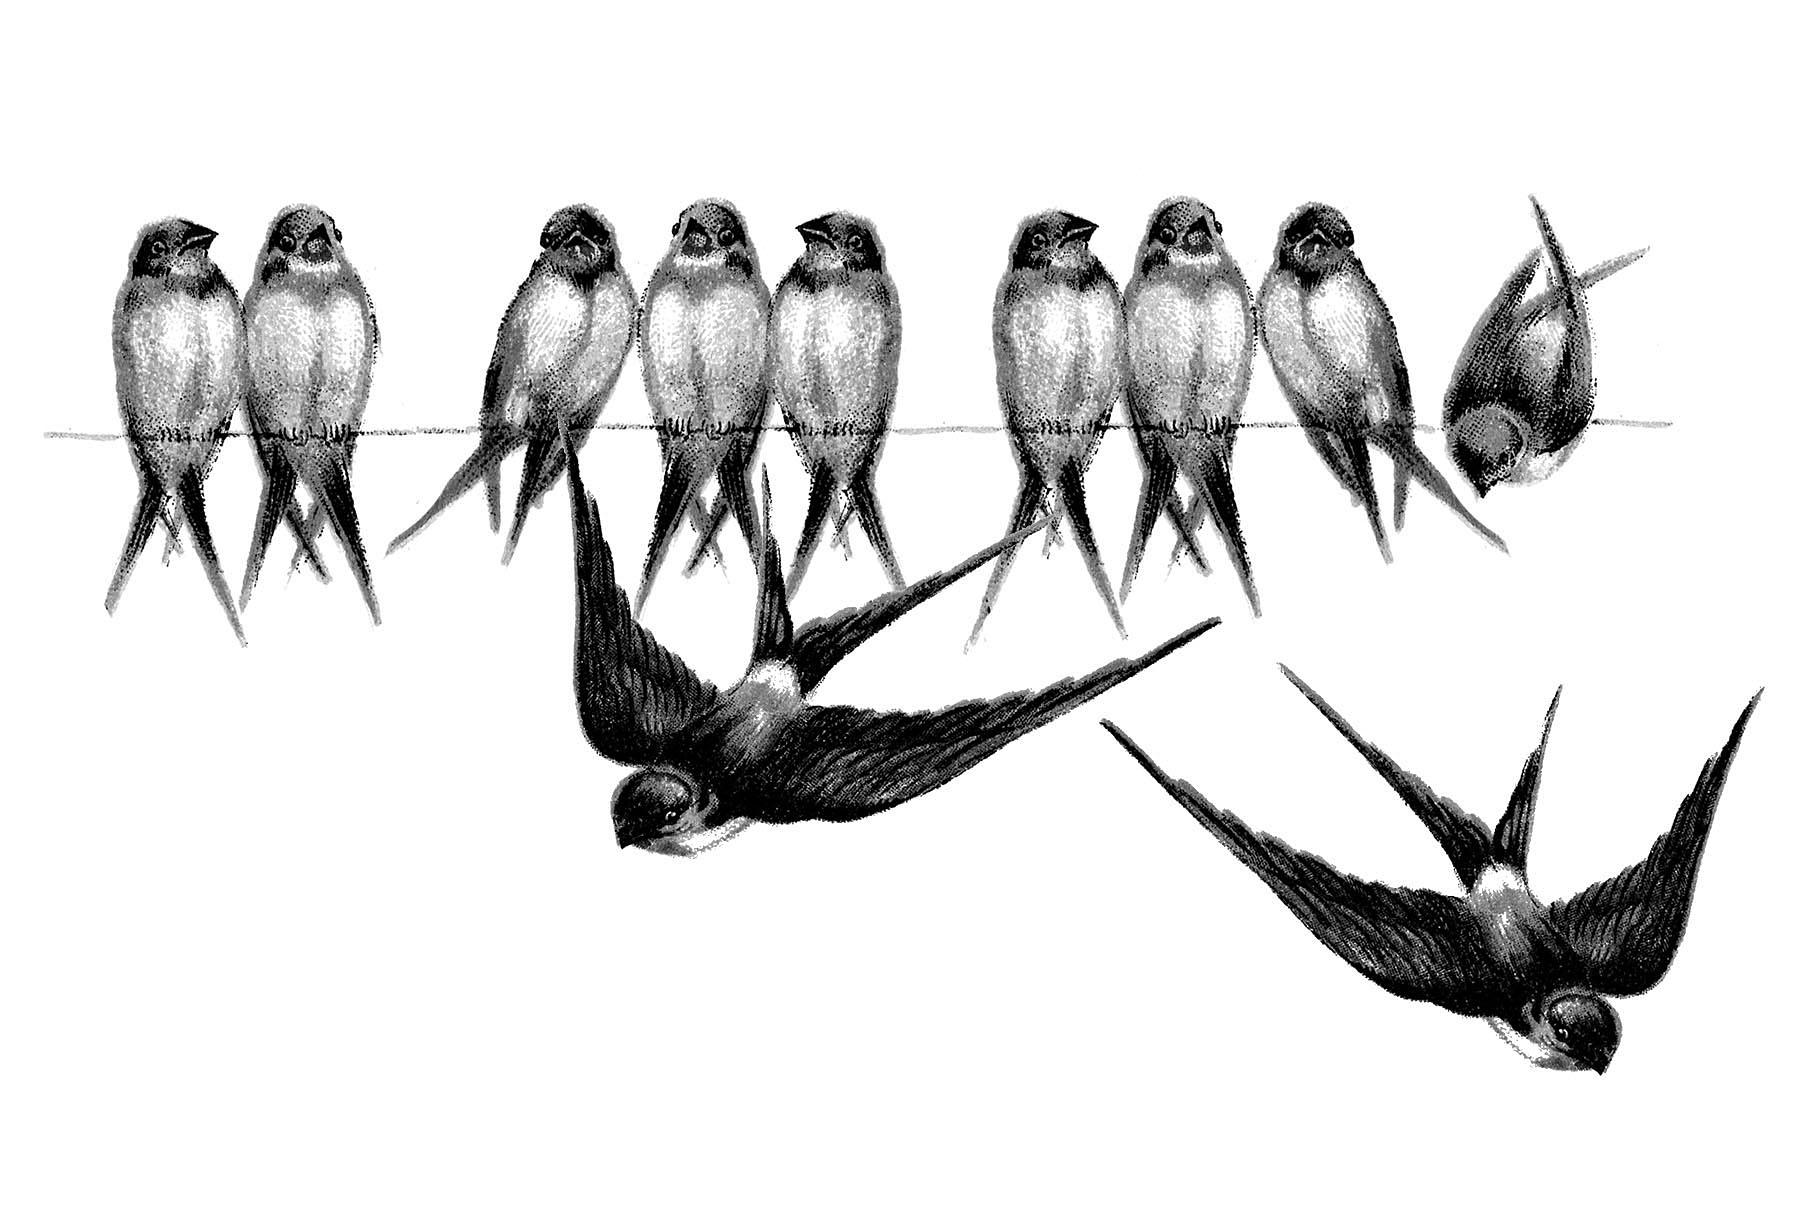 Vintage Bird Image Swallows On Line